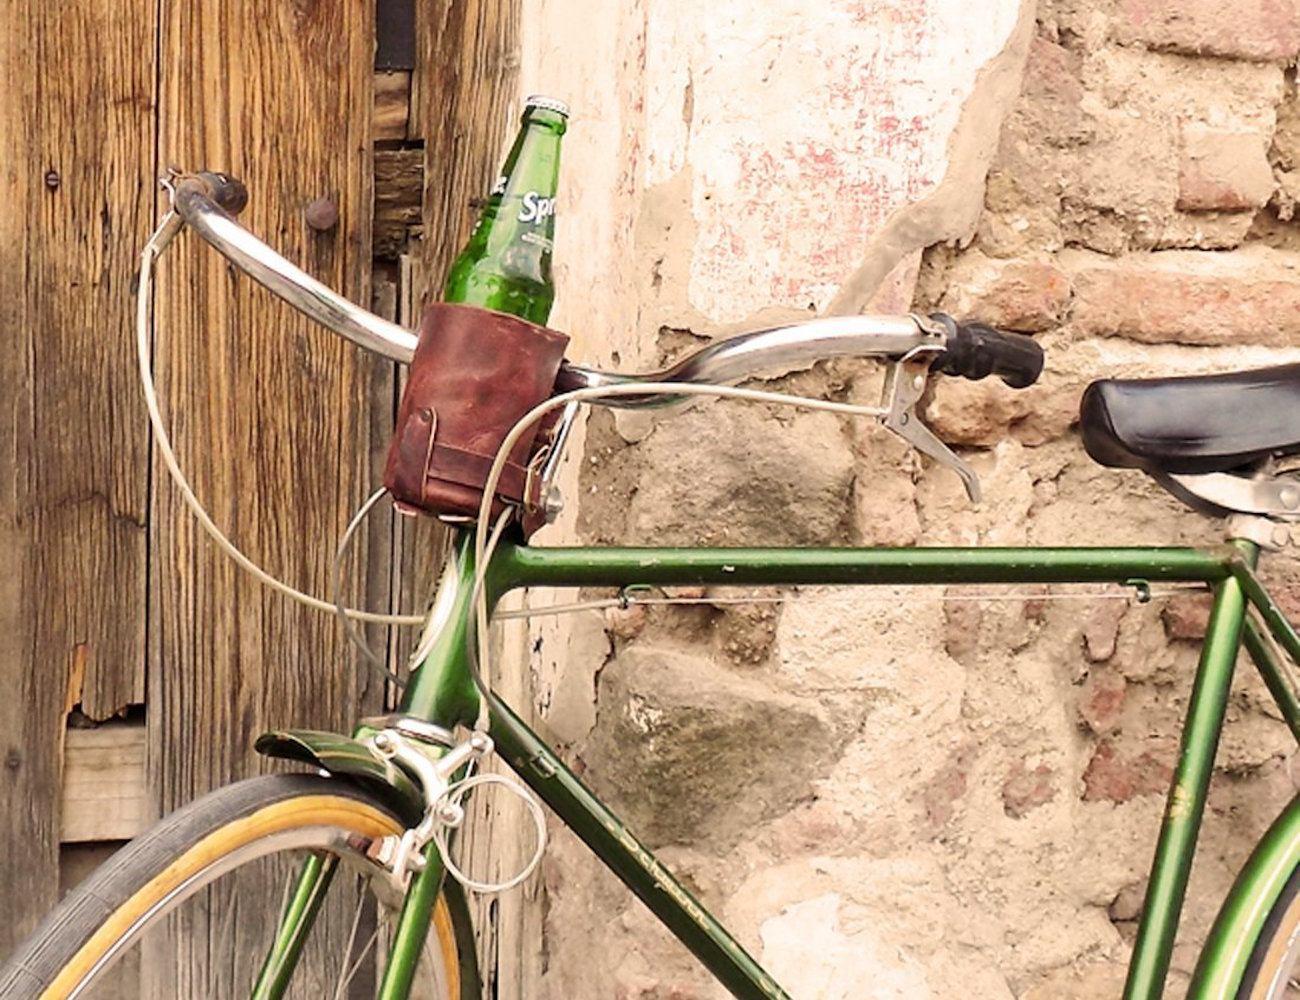 Cruzy Kozy Leather Bike Cup Holder by Hide & Drink